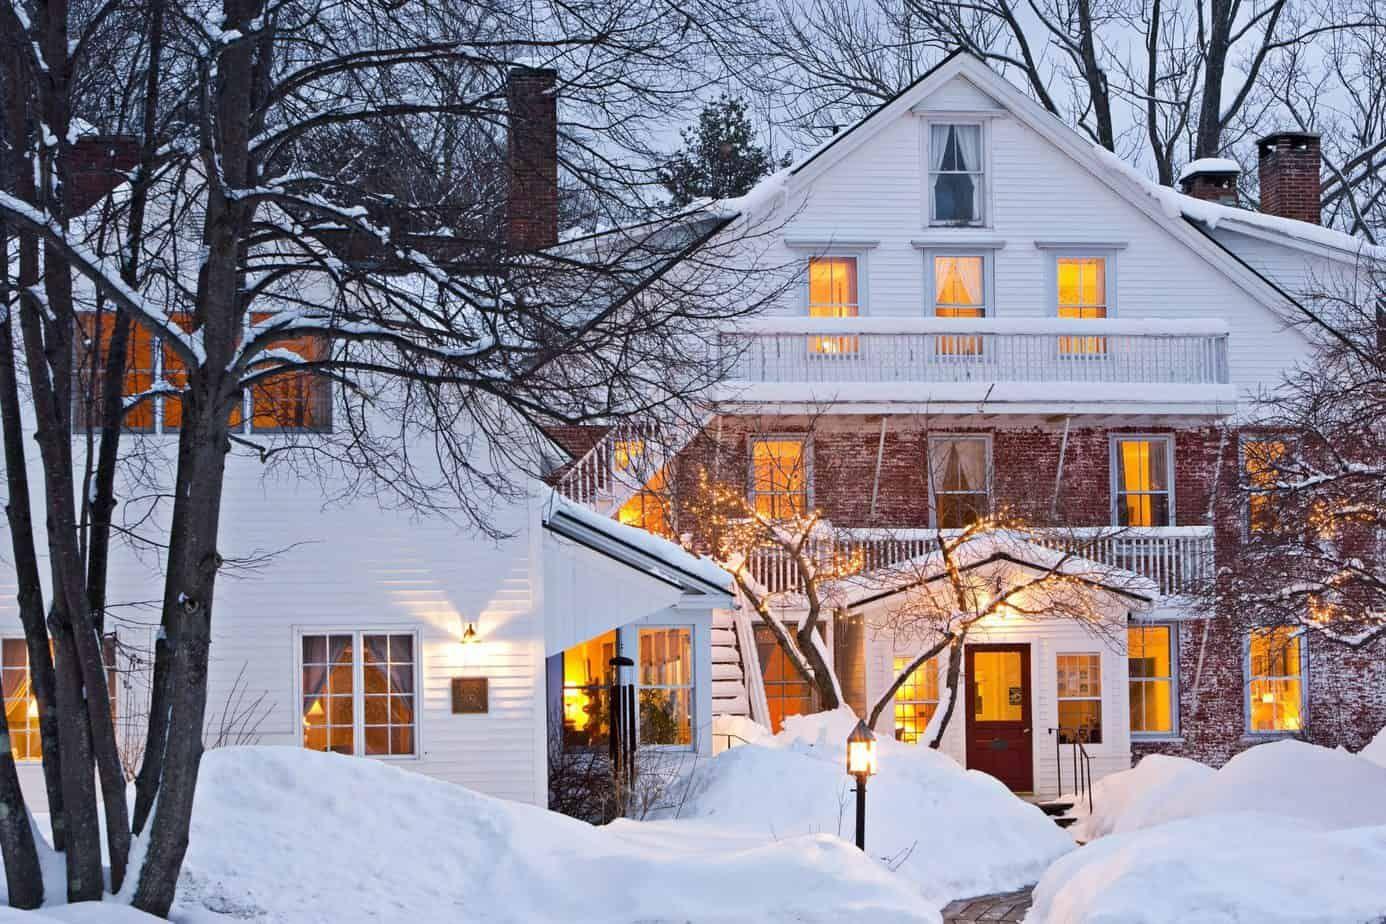 20 Romantic Getaways in New England Love & Luxury for